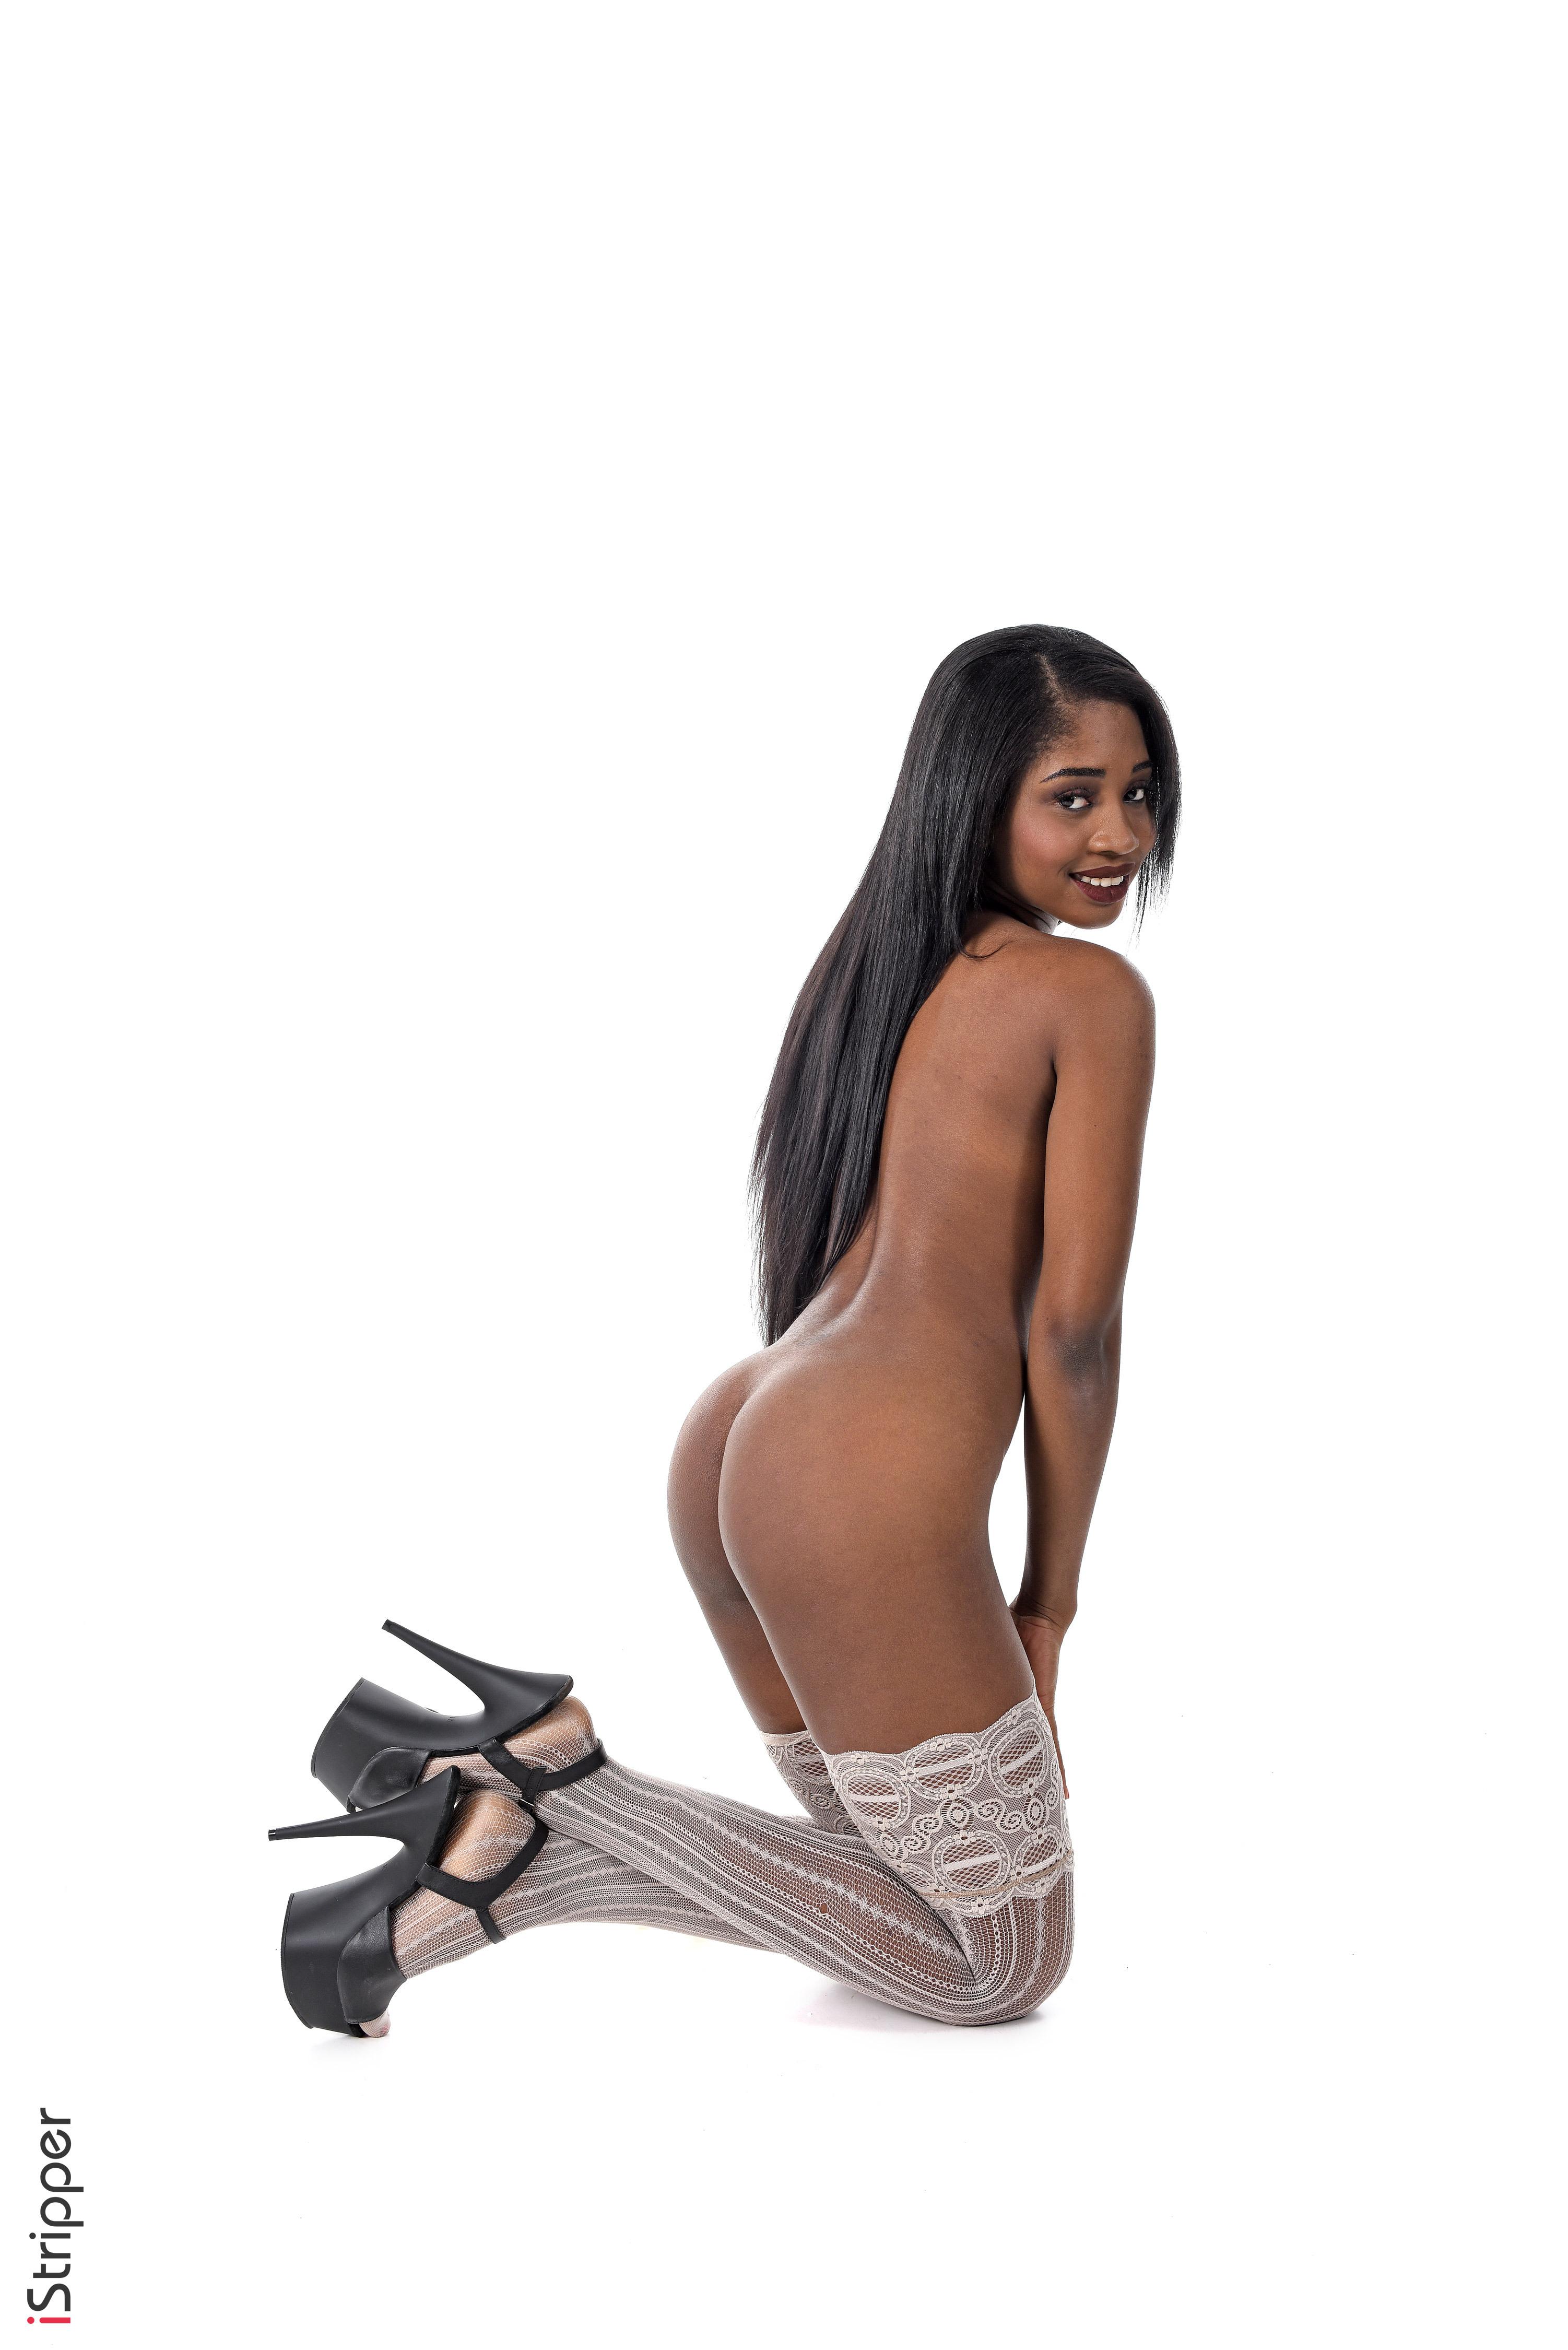 nude girls wallpapers